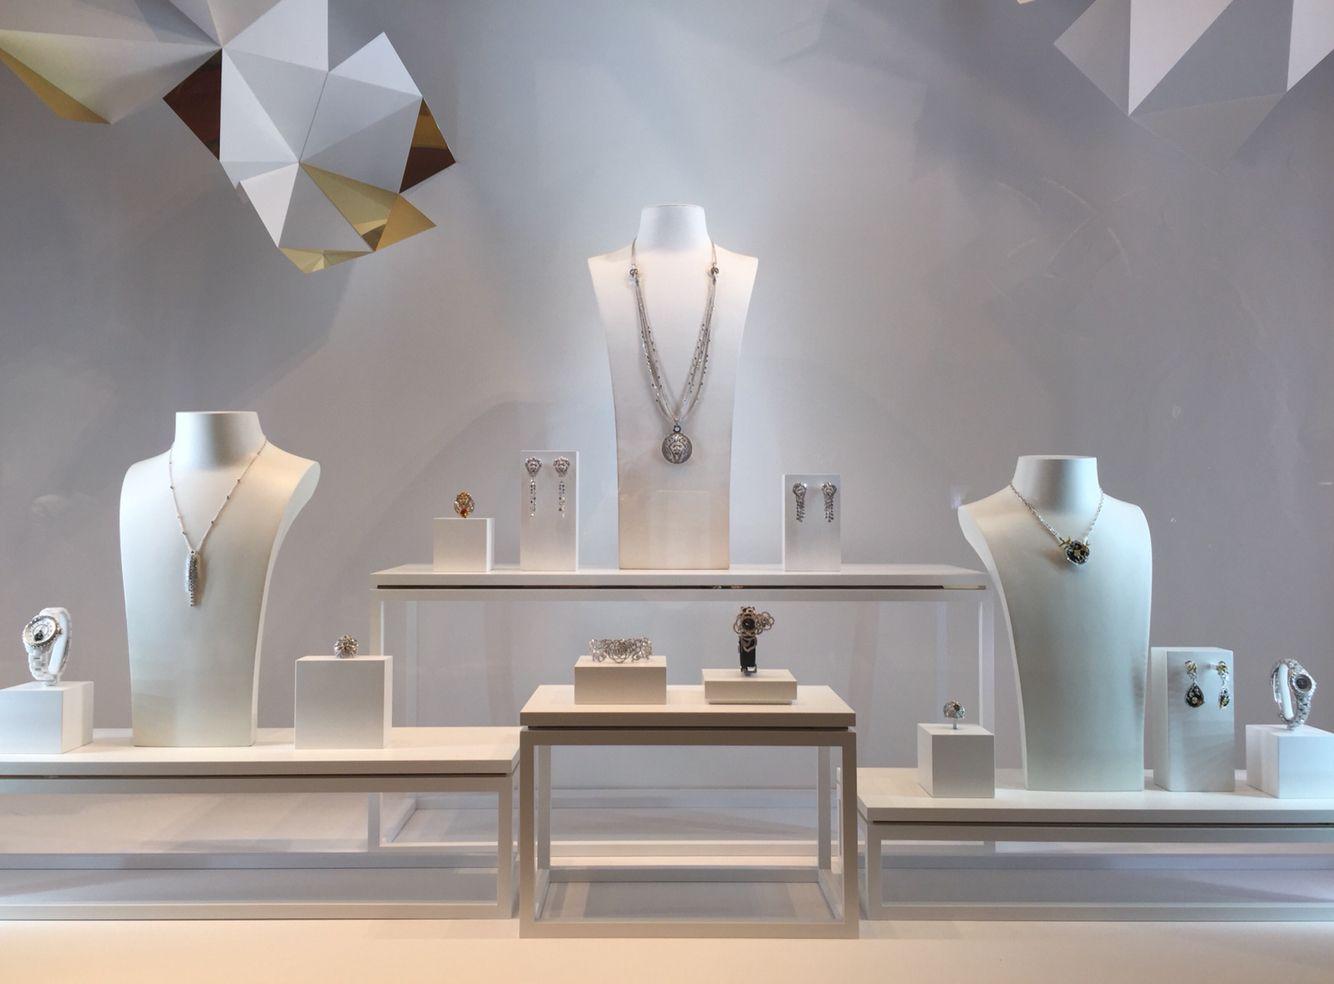 Window display ideas for jewelry  chanel fine jewelry window display  display  pinterest  window